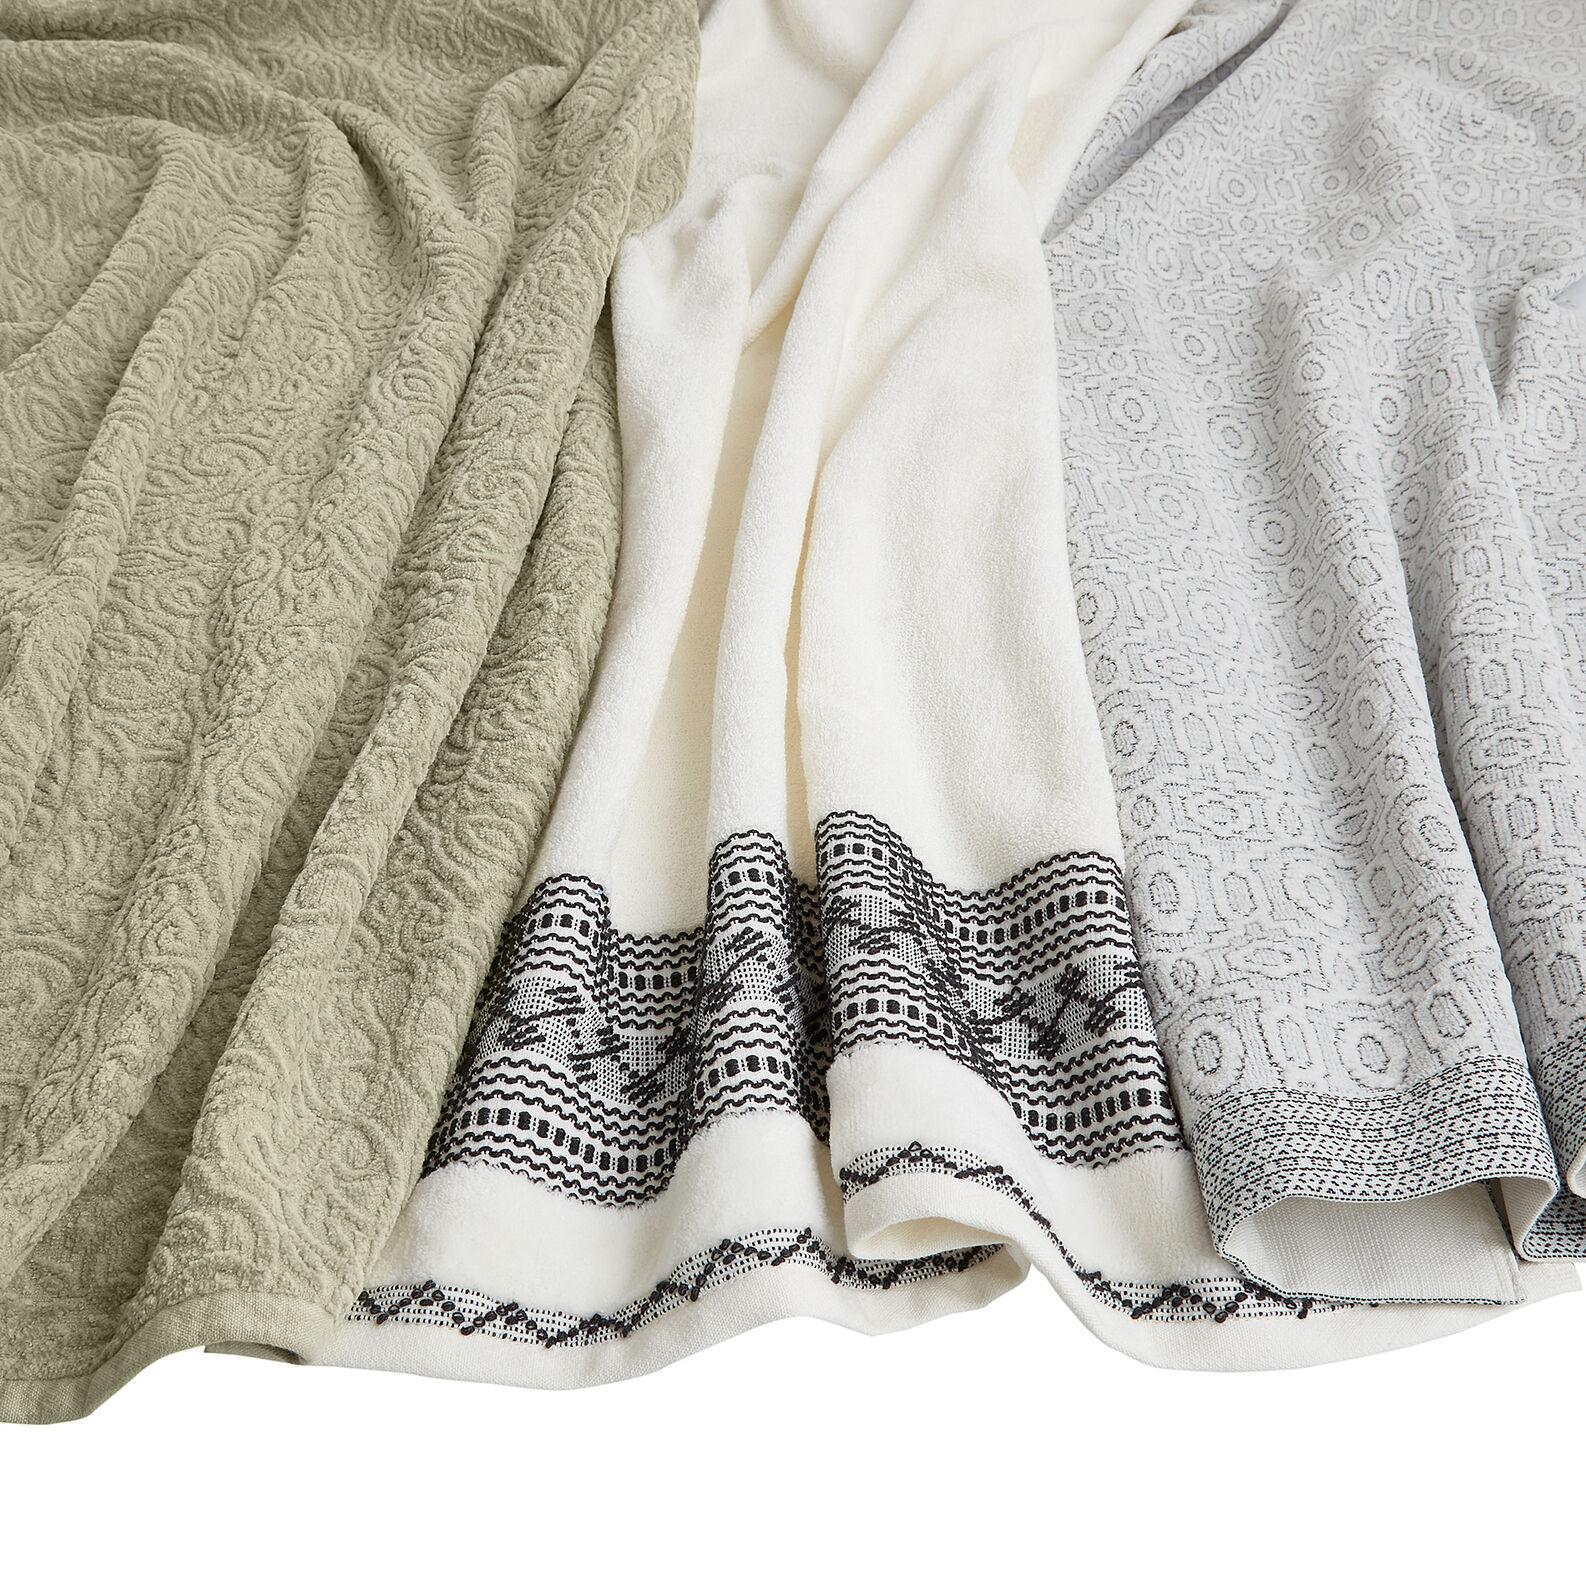 Asciugamano puro cotone jacquard ricamo